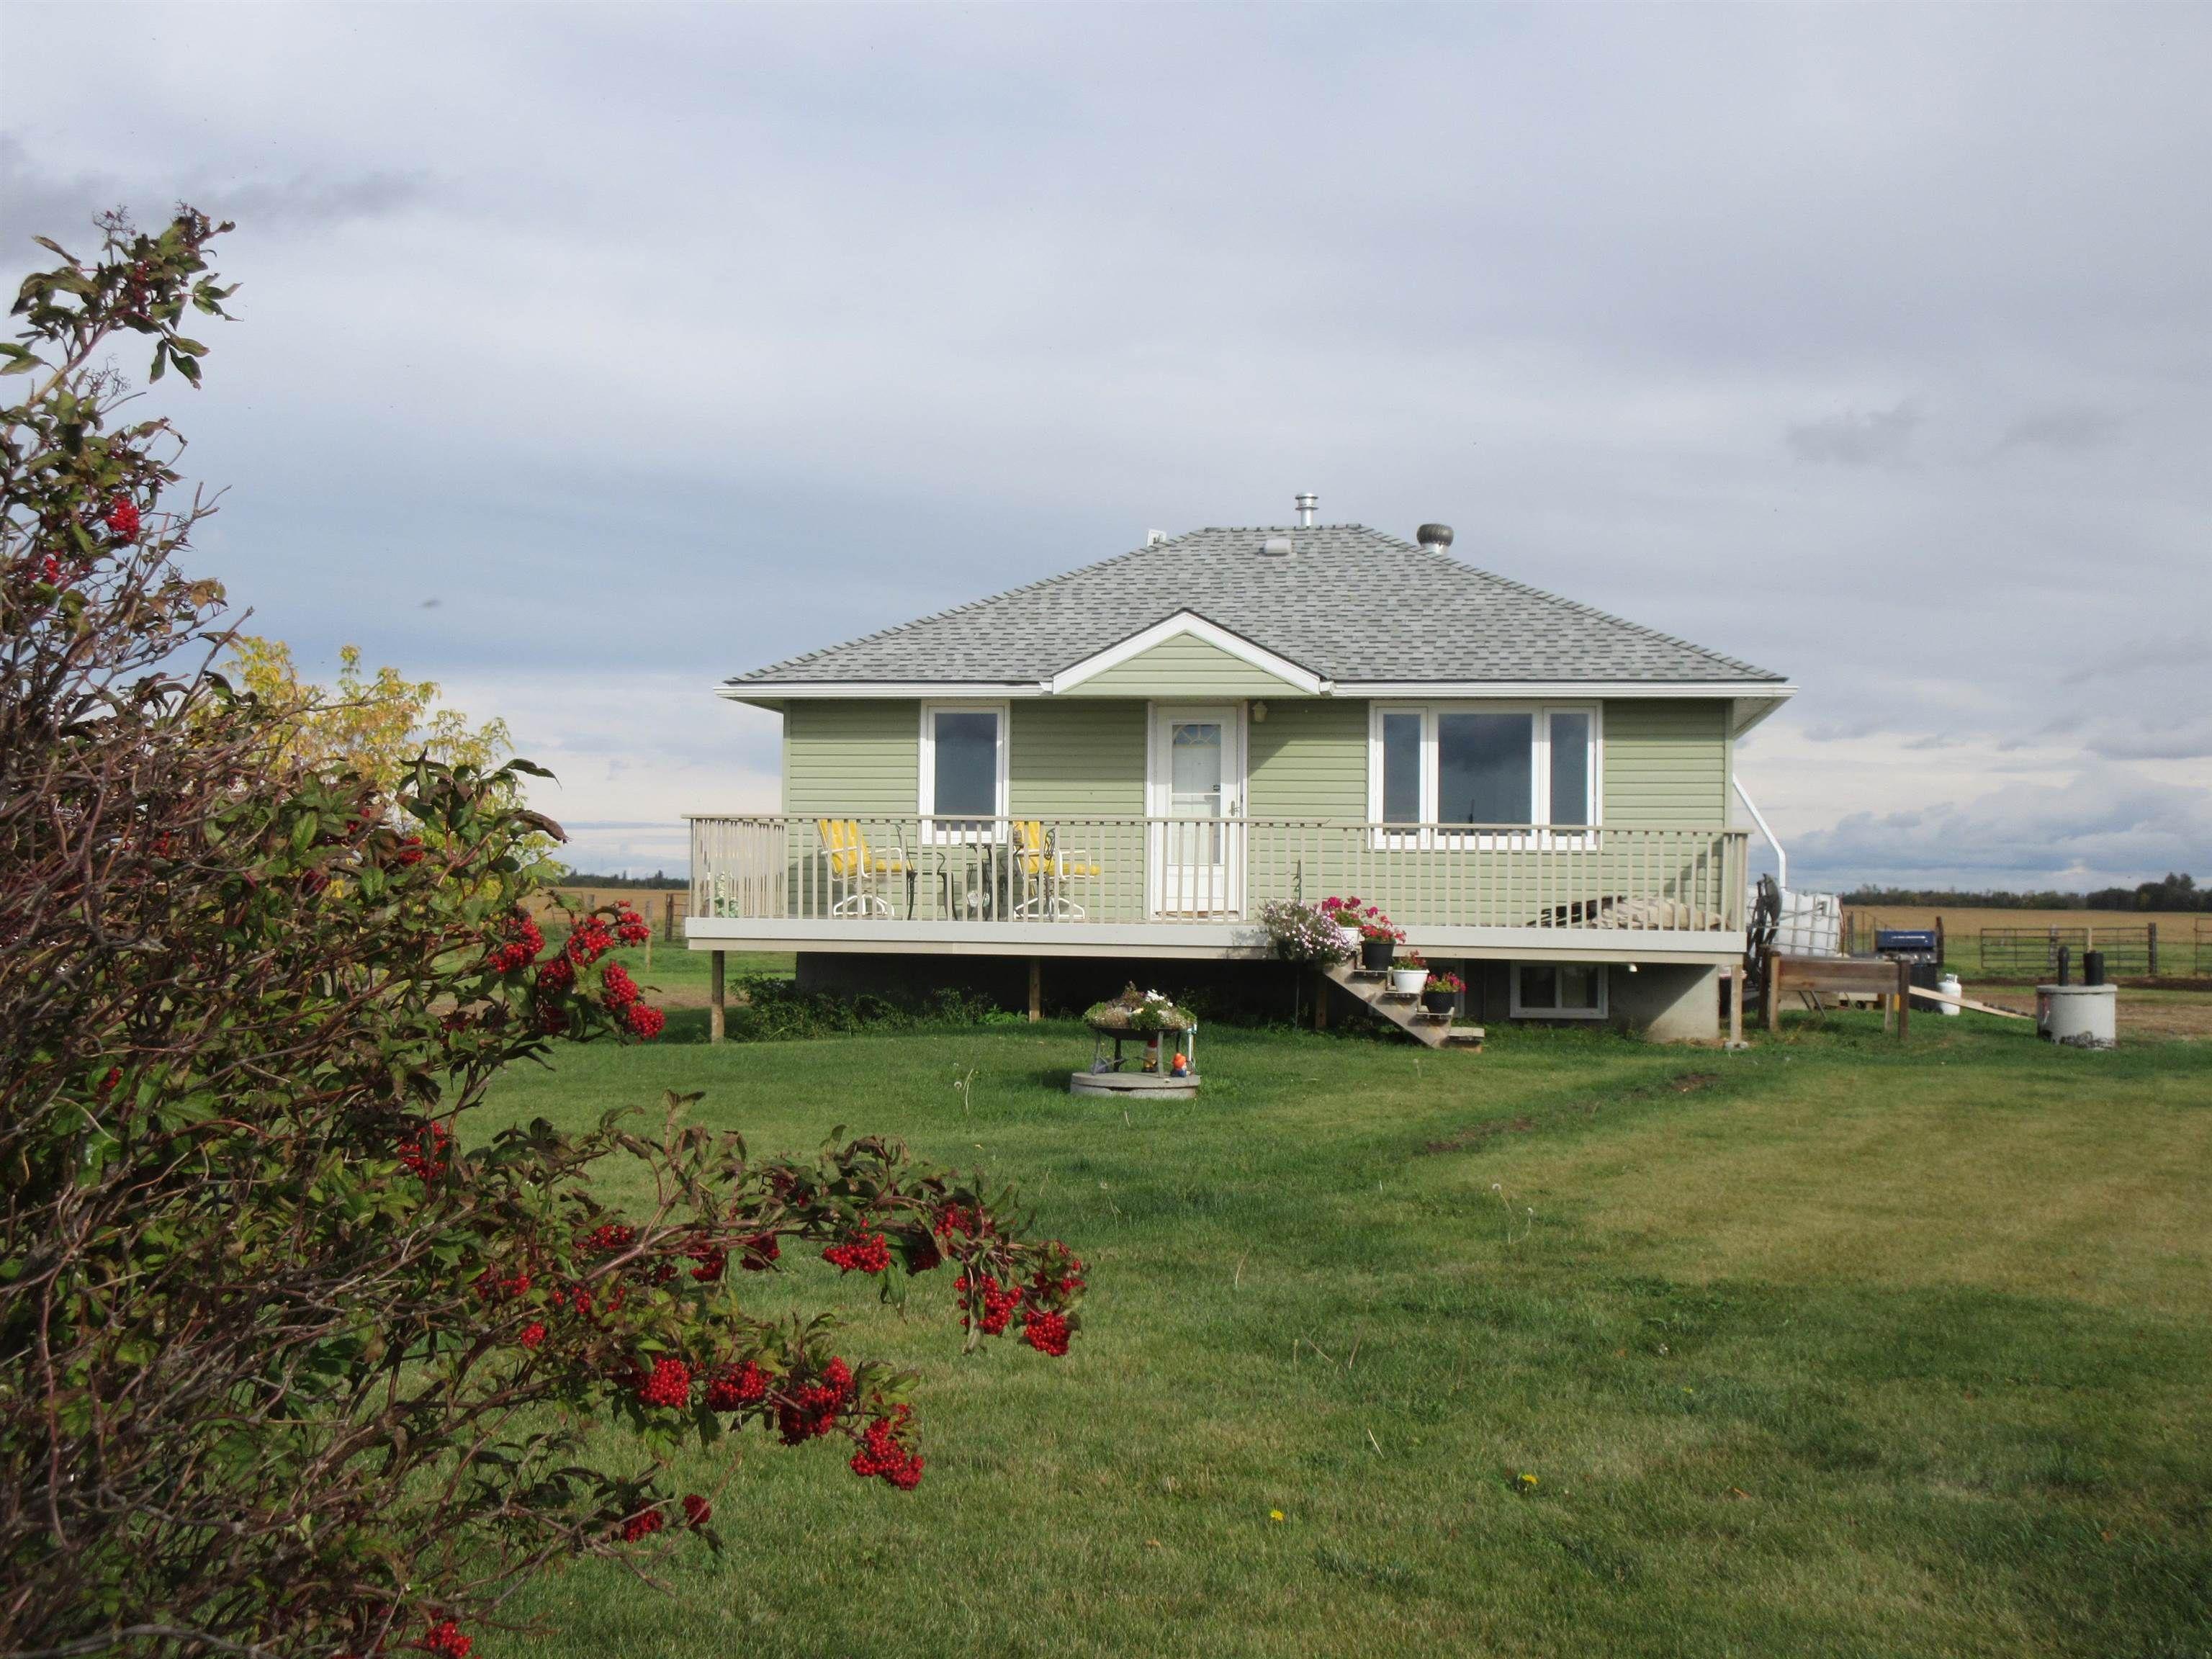 Main Photo: 59157 RR 195: Rural Smoky Lake County House for sale : MLS®# E4262491